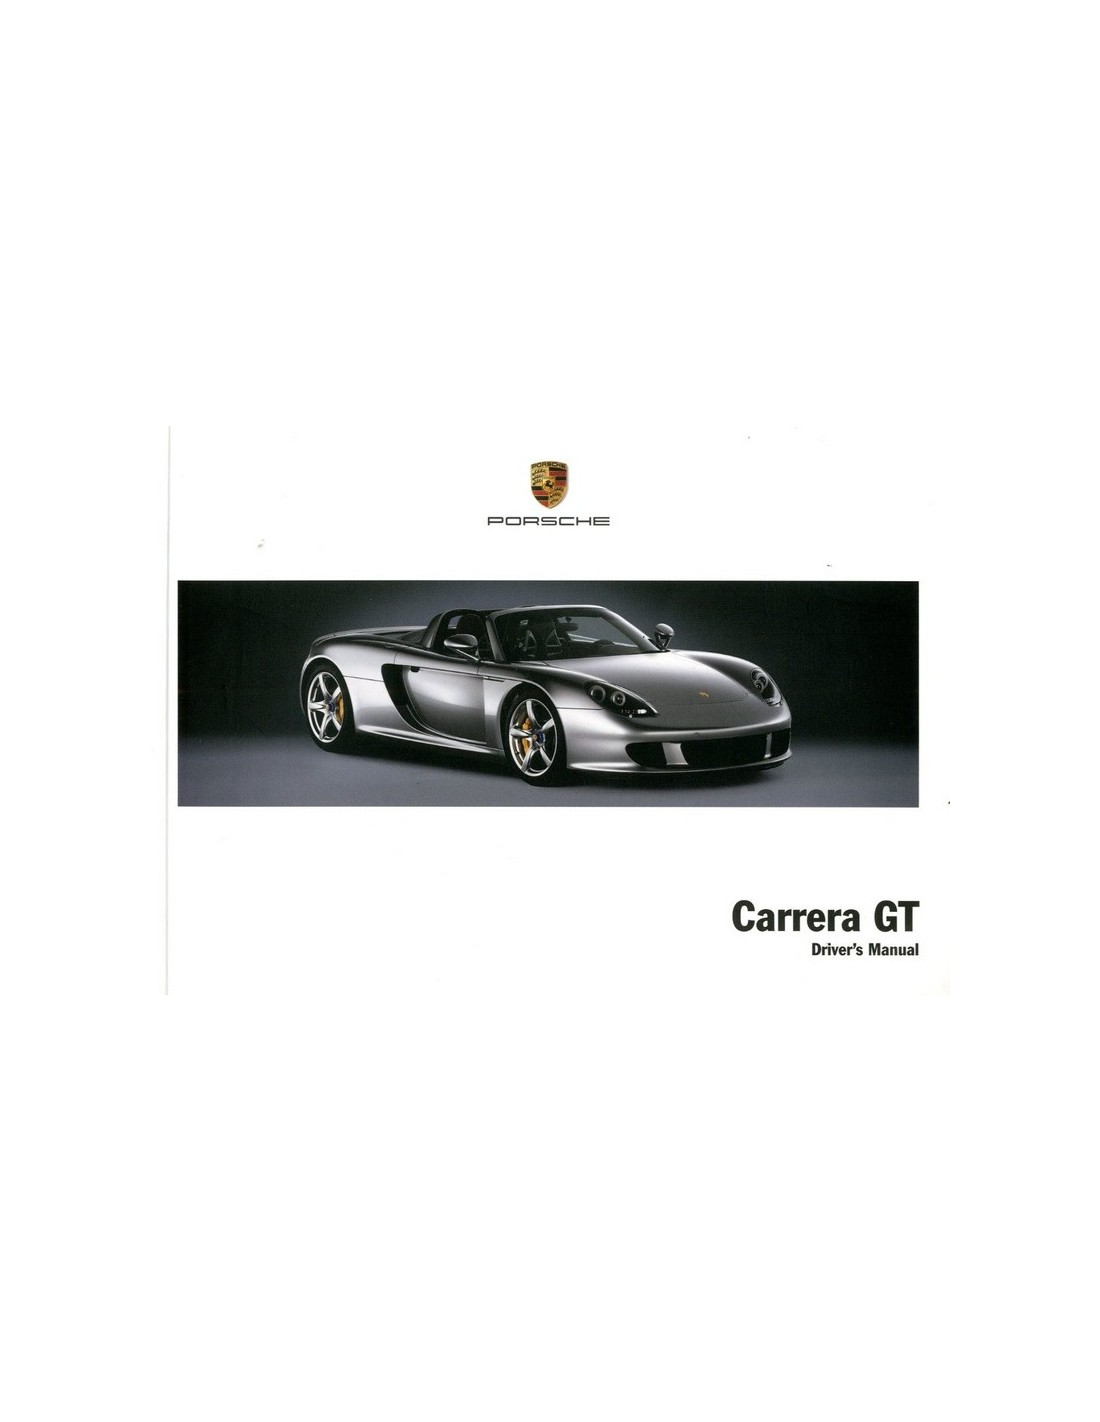 2003 porsche carrera gt owners manual english rh autolit eu porsche carrera gt owners manual Carrera GT Interior